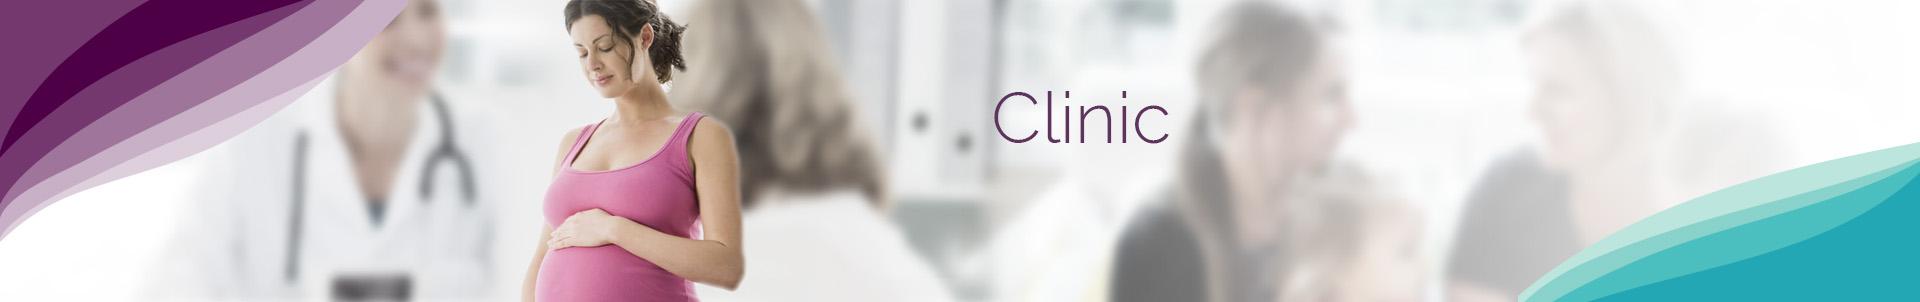 Clinics at Apollo Cradle